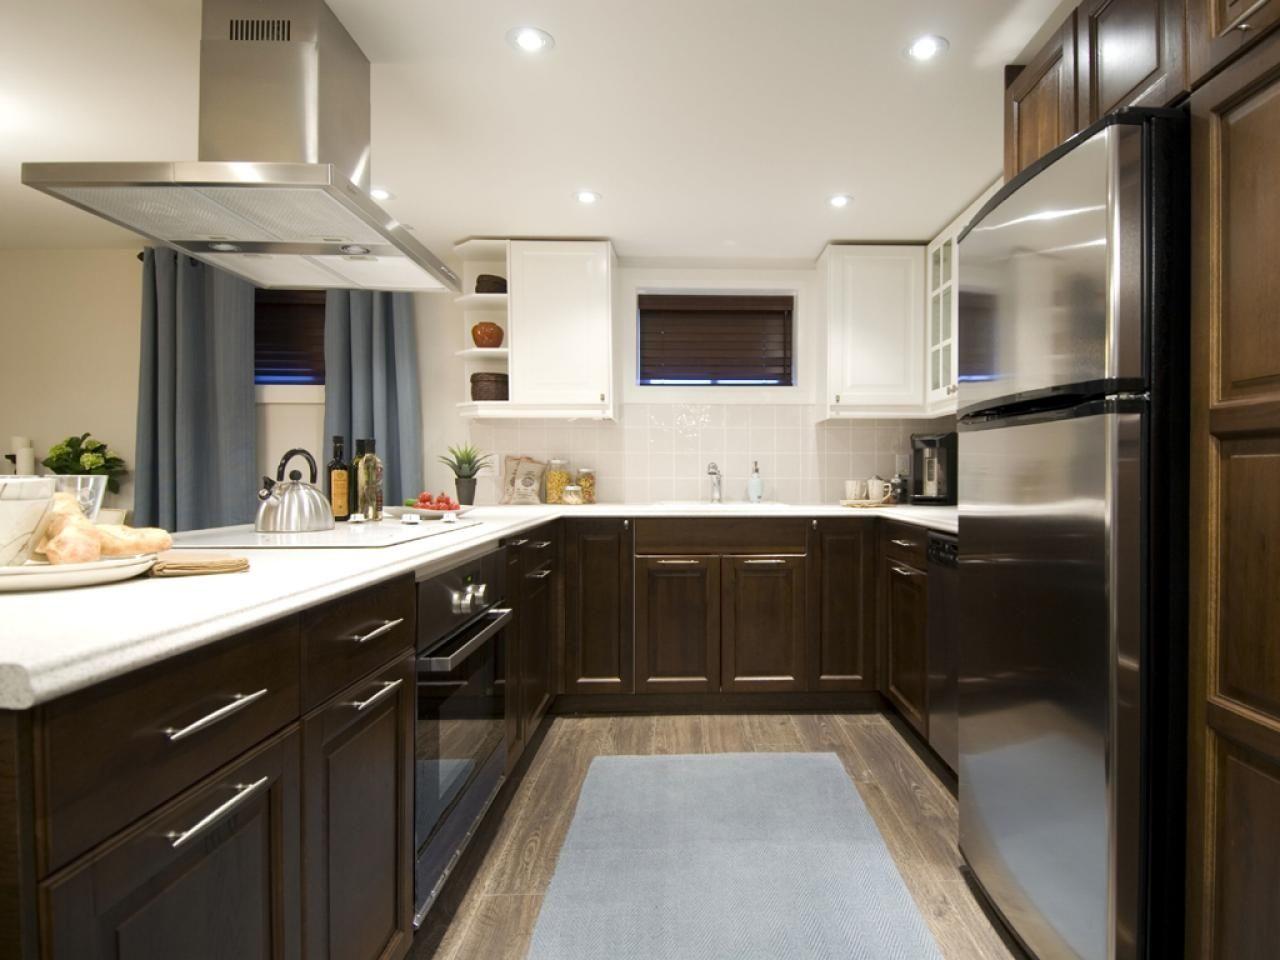 Merveilleux Two Colors Kitchen Cabinets